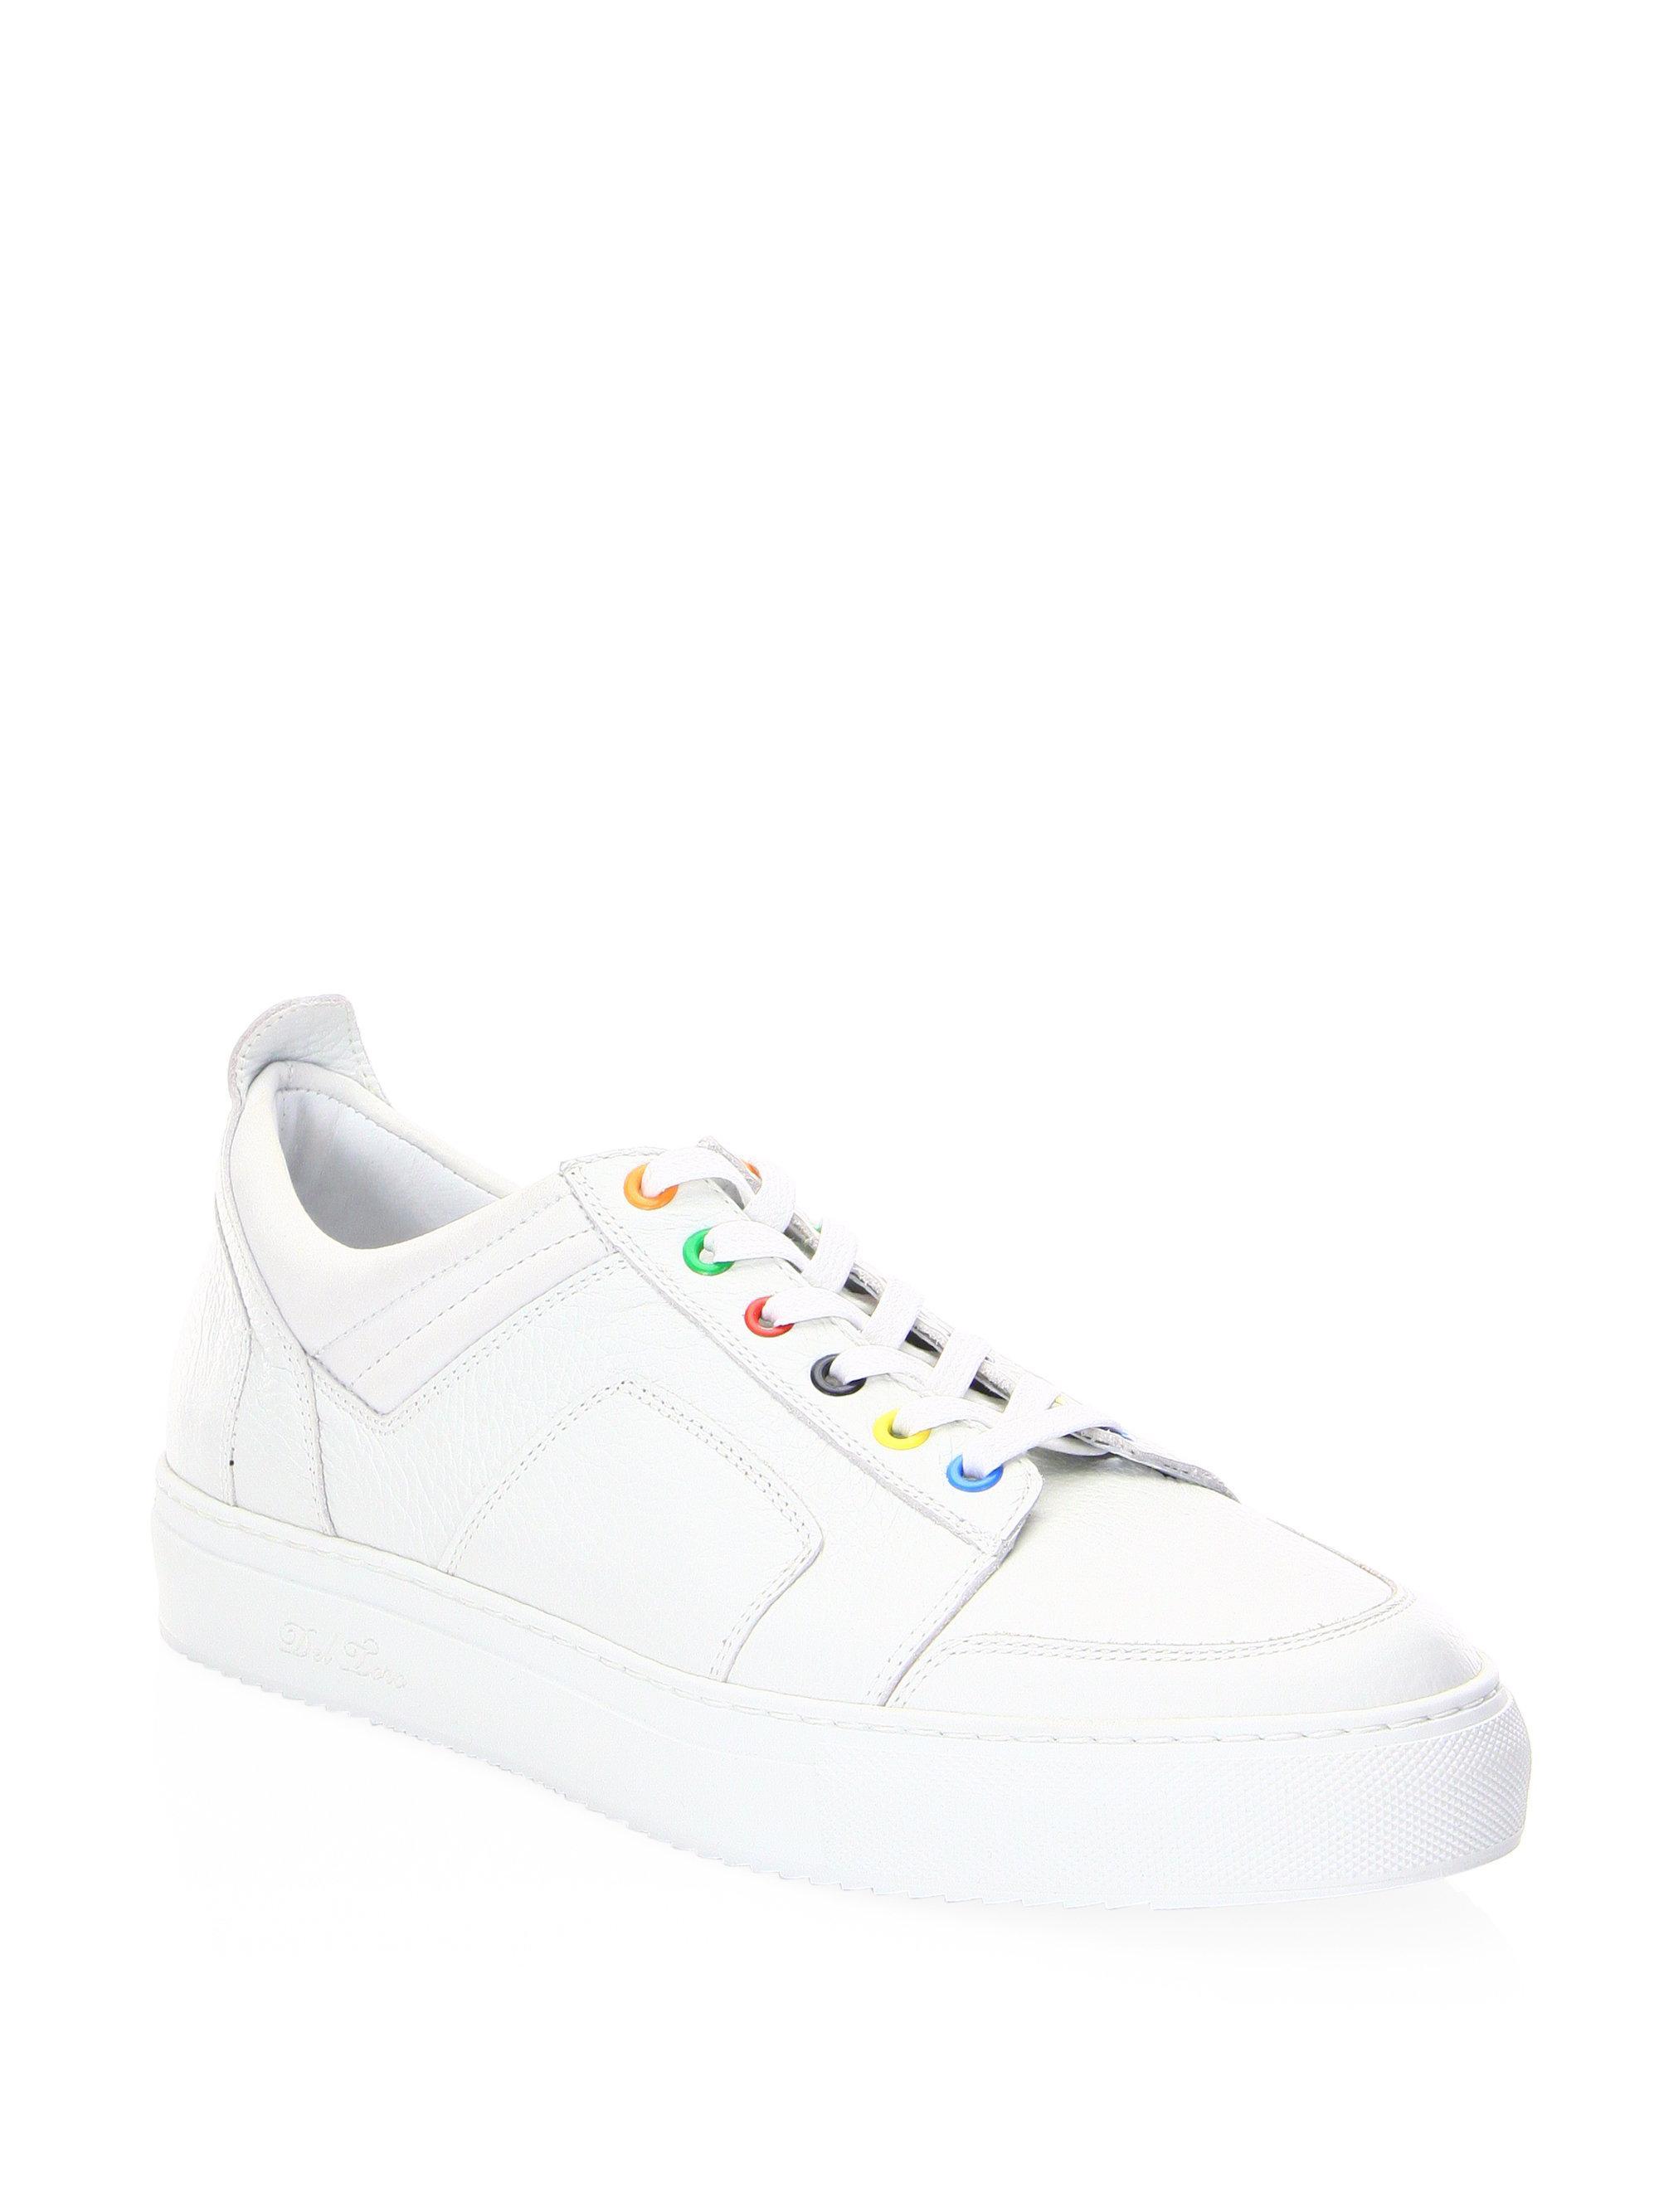 DEL TORO Velvet Low-Top Sneakers 8OKknN